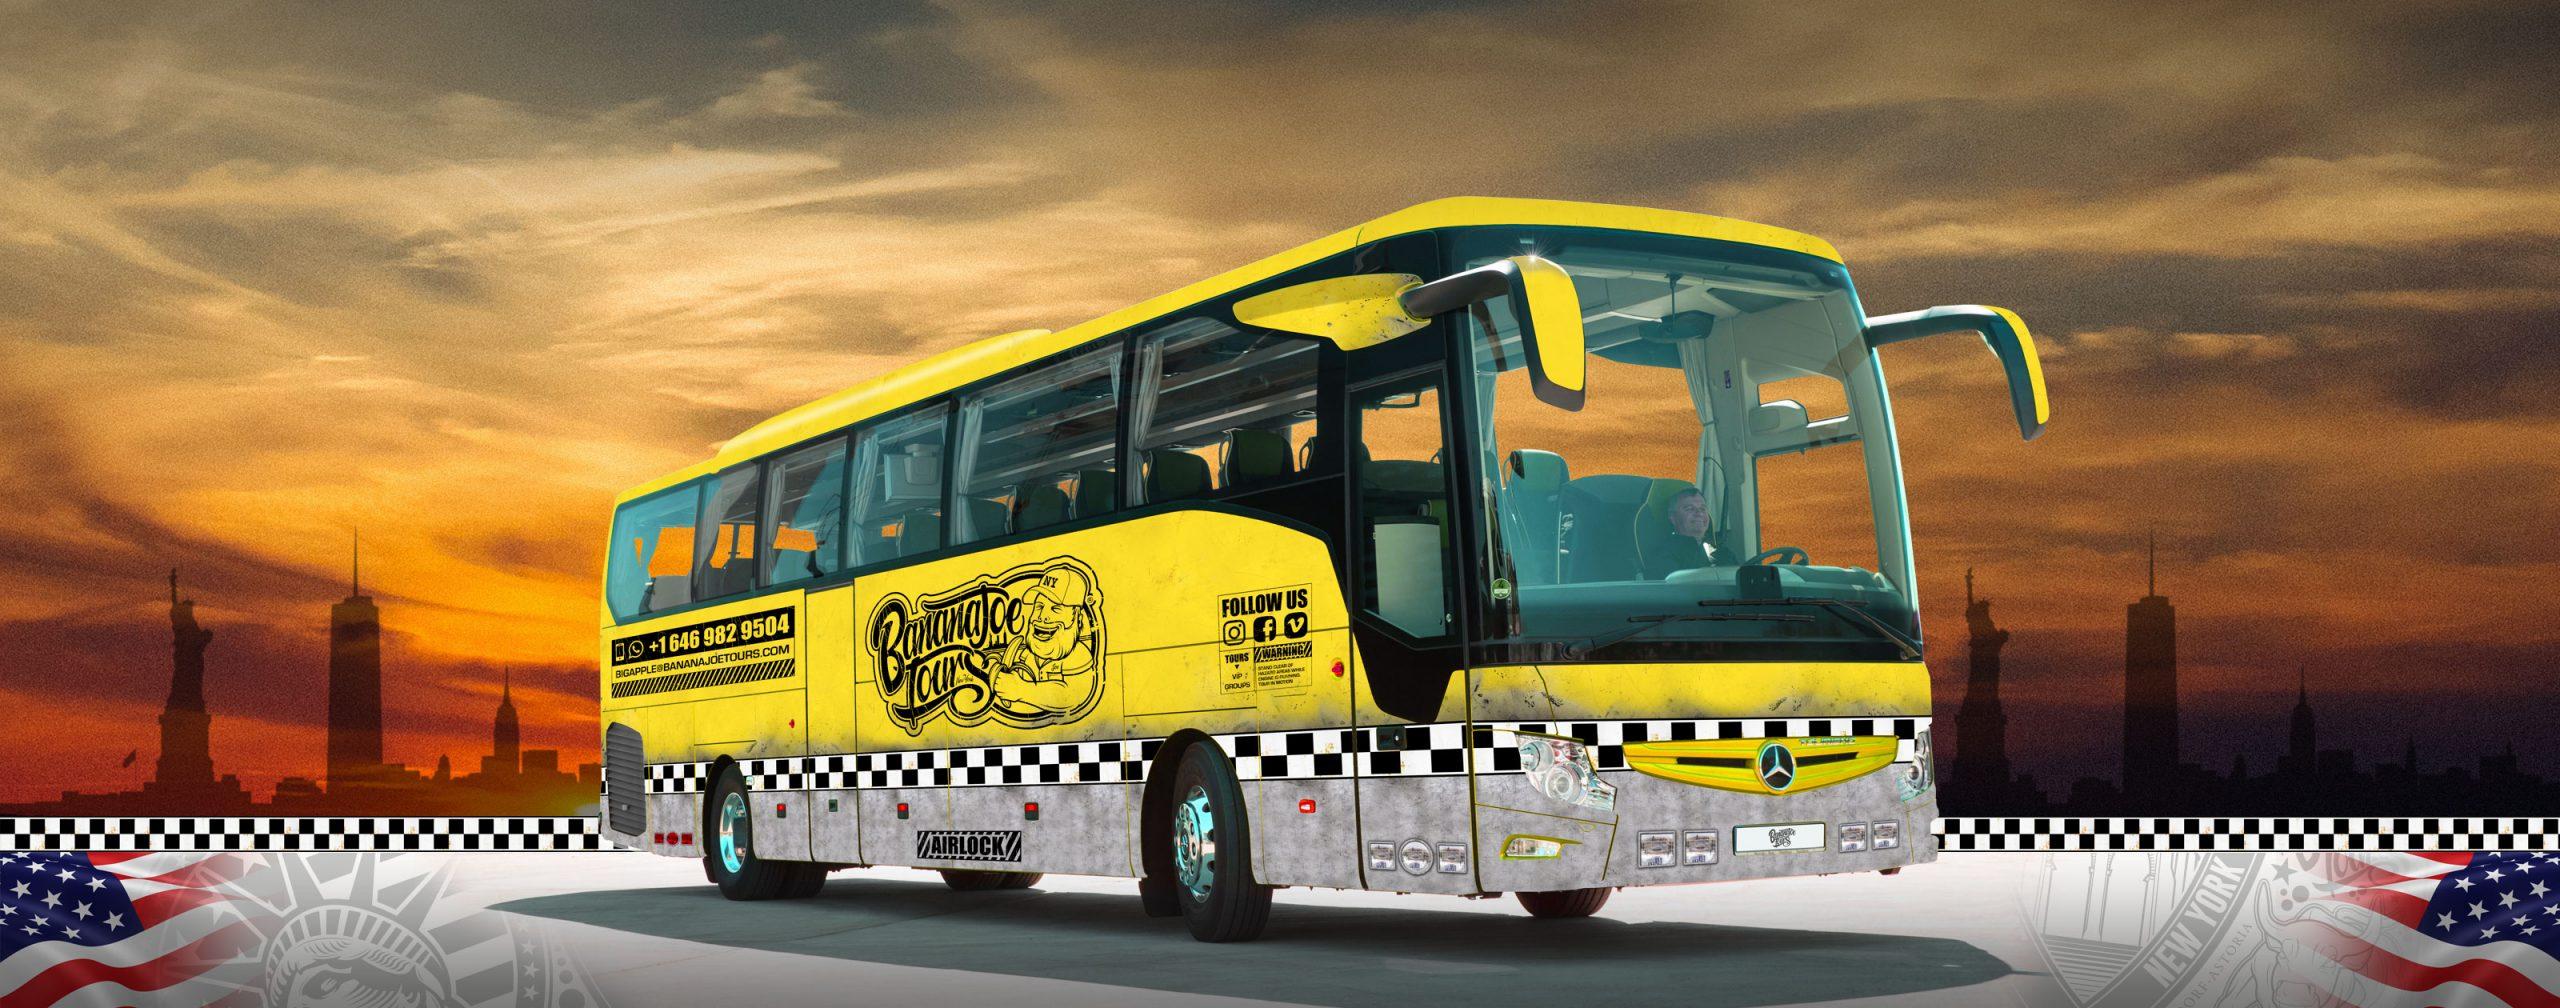 banana-joe-tours-new-york-group-travel